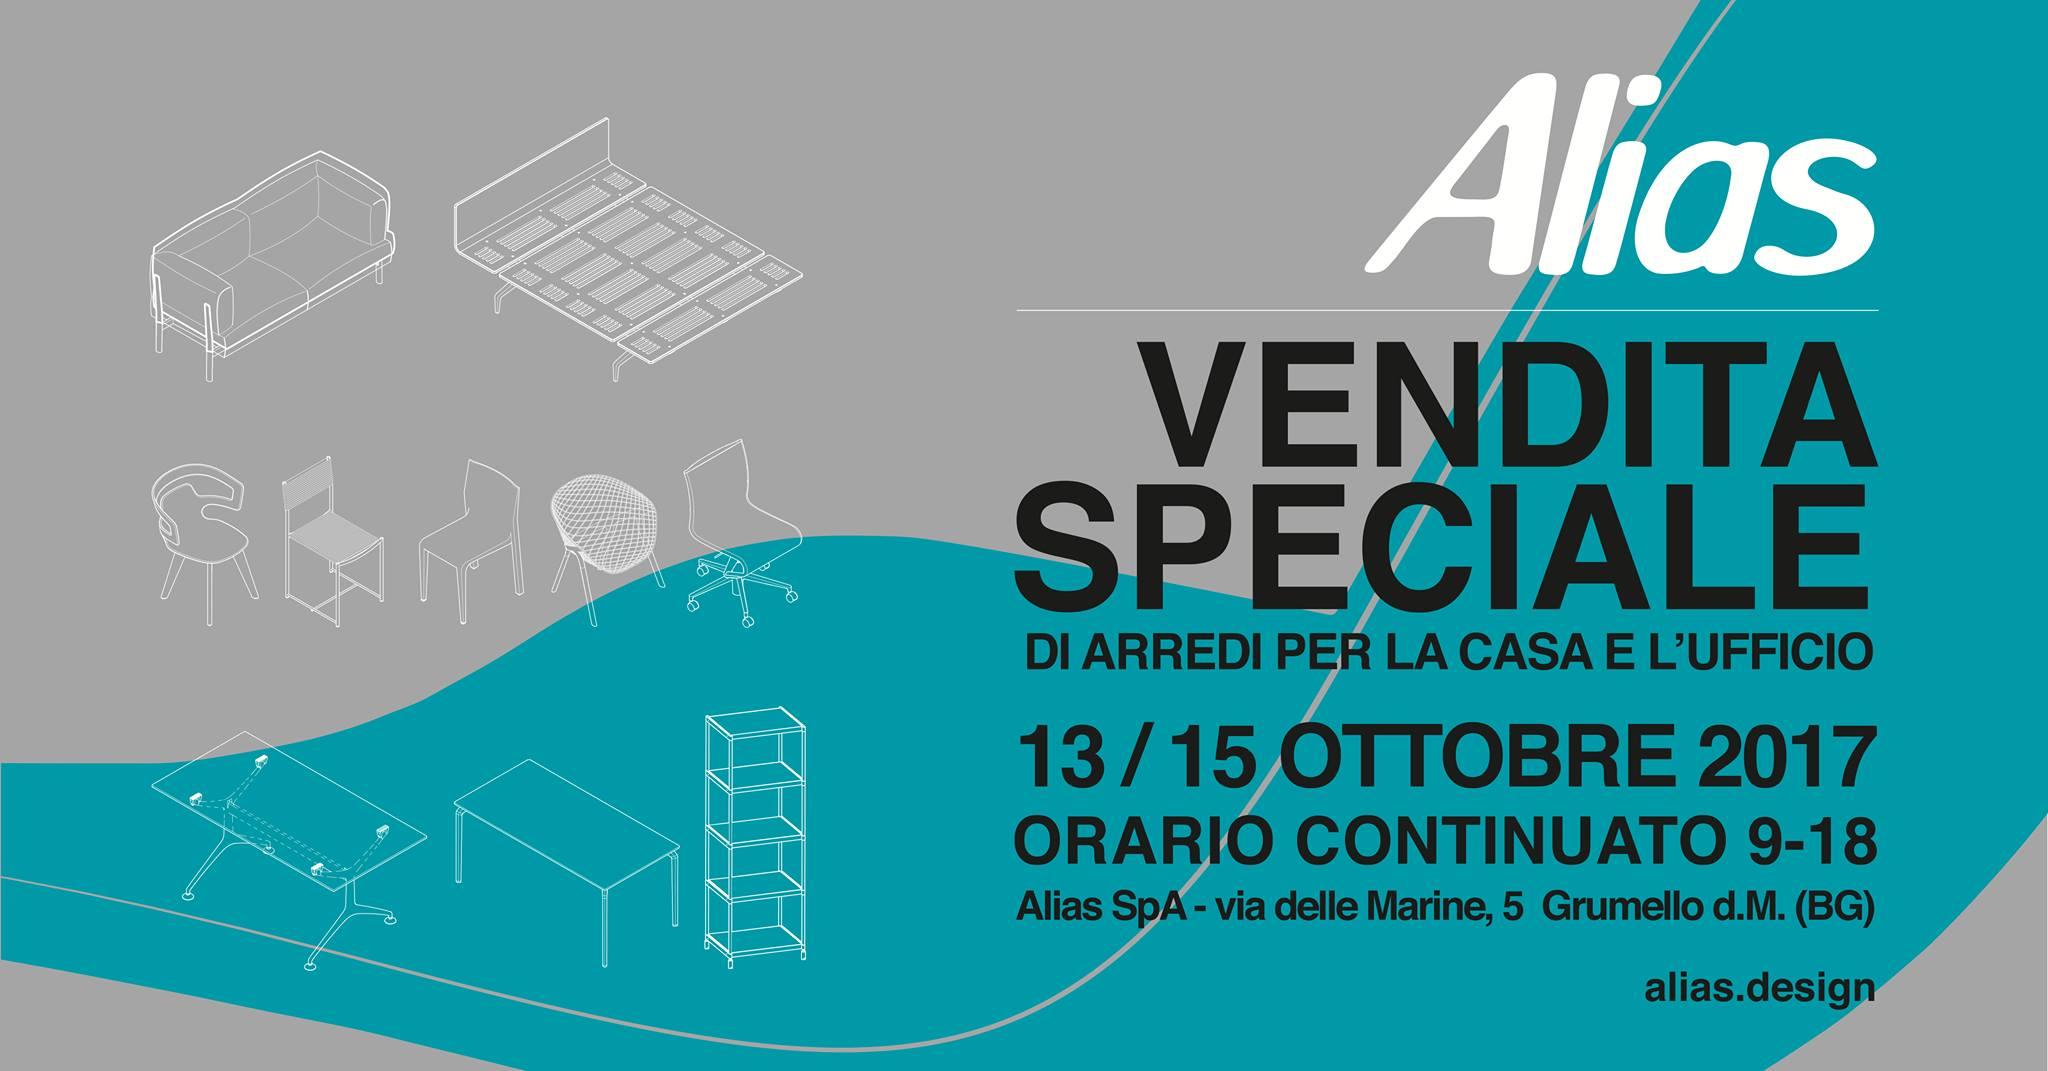 Vendita speciale alias ottobre 2017 design x all - Artemide vendita straordinaria 2017 ...